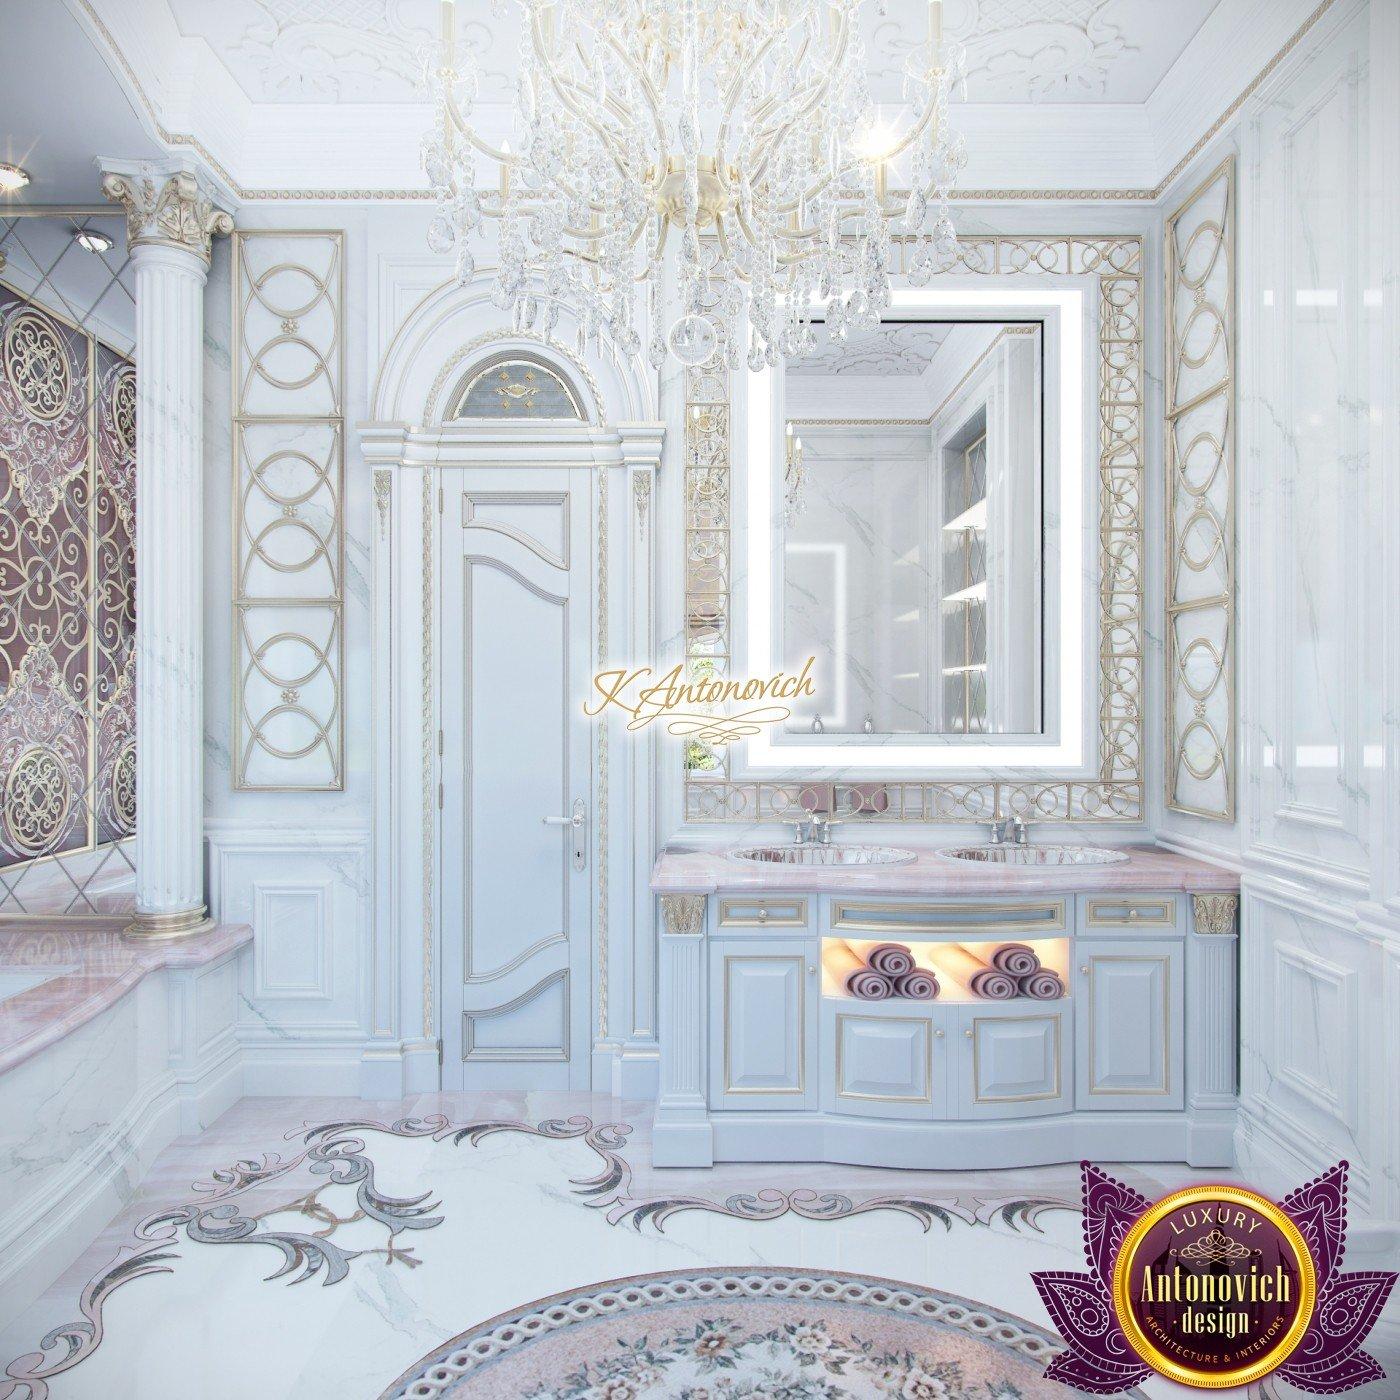 Gallery Kitchen Dubai Bath And